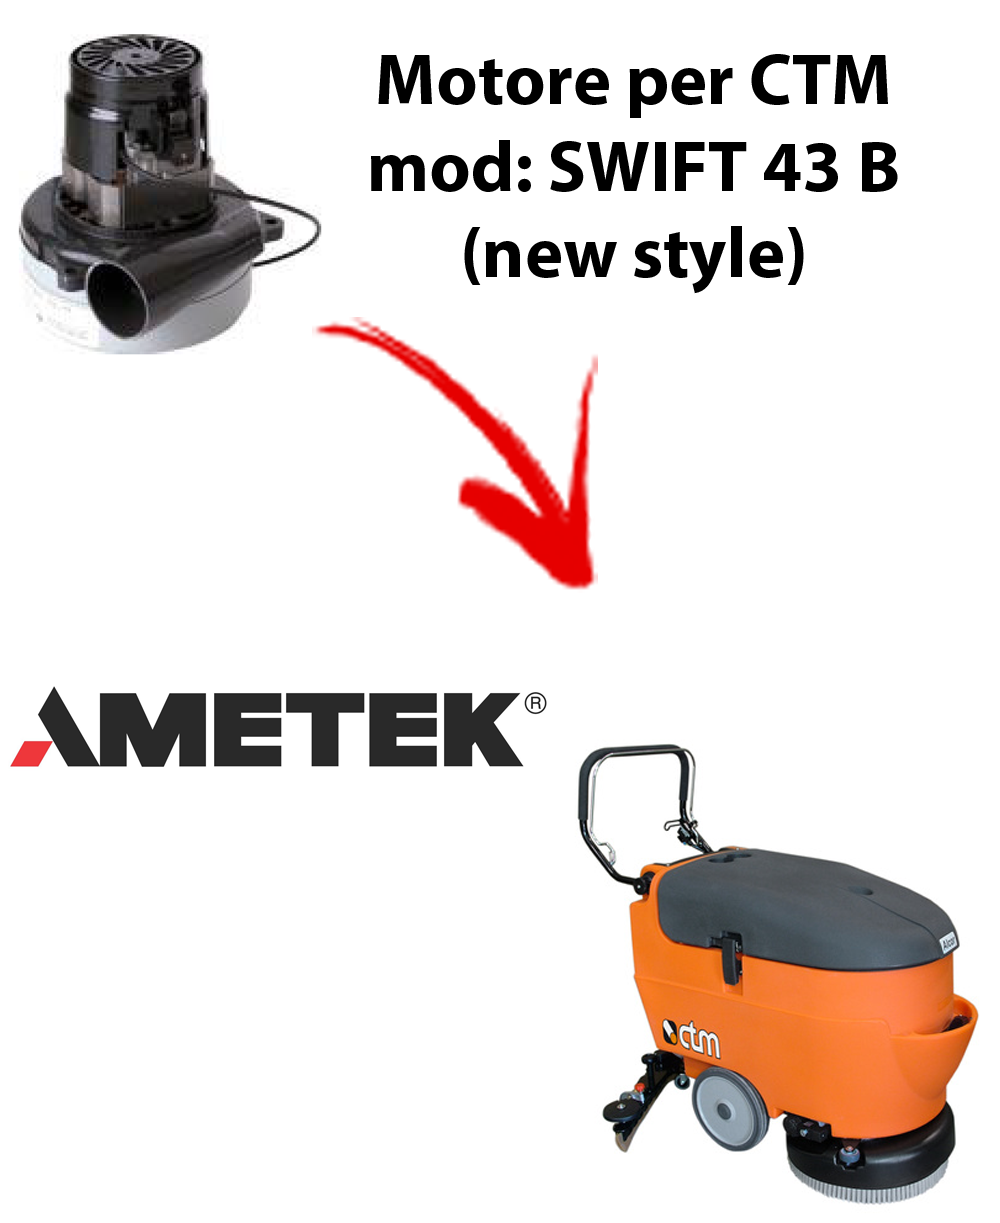 SWIFT 43B New Style Motore de aspiración AMETEK para fregadora CTM